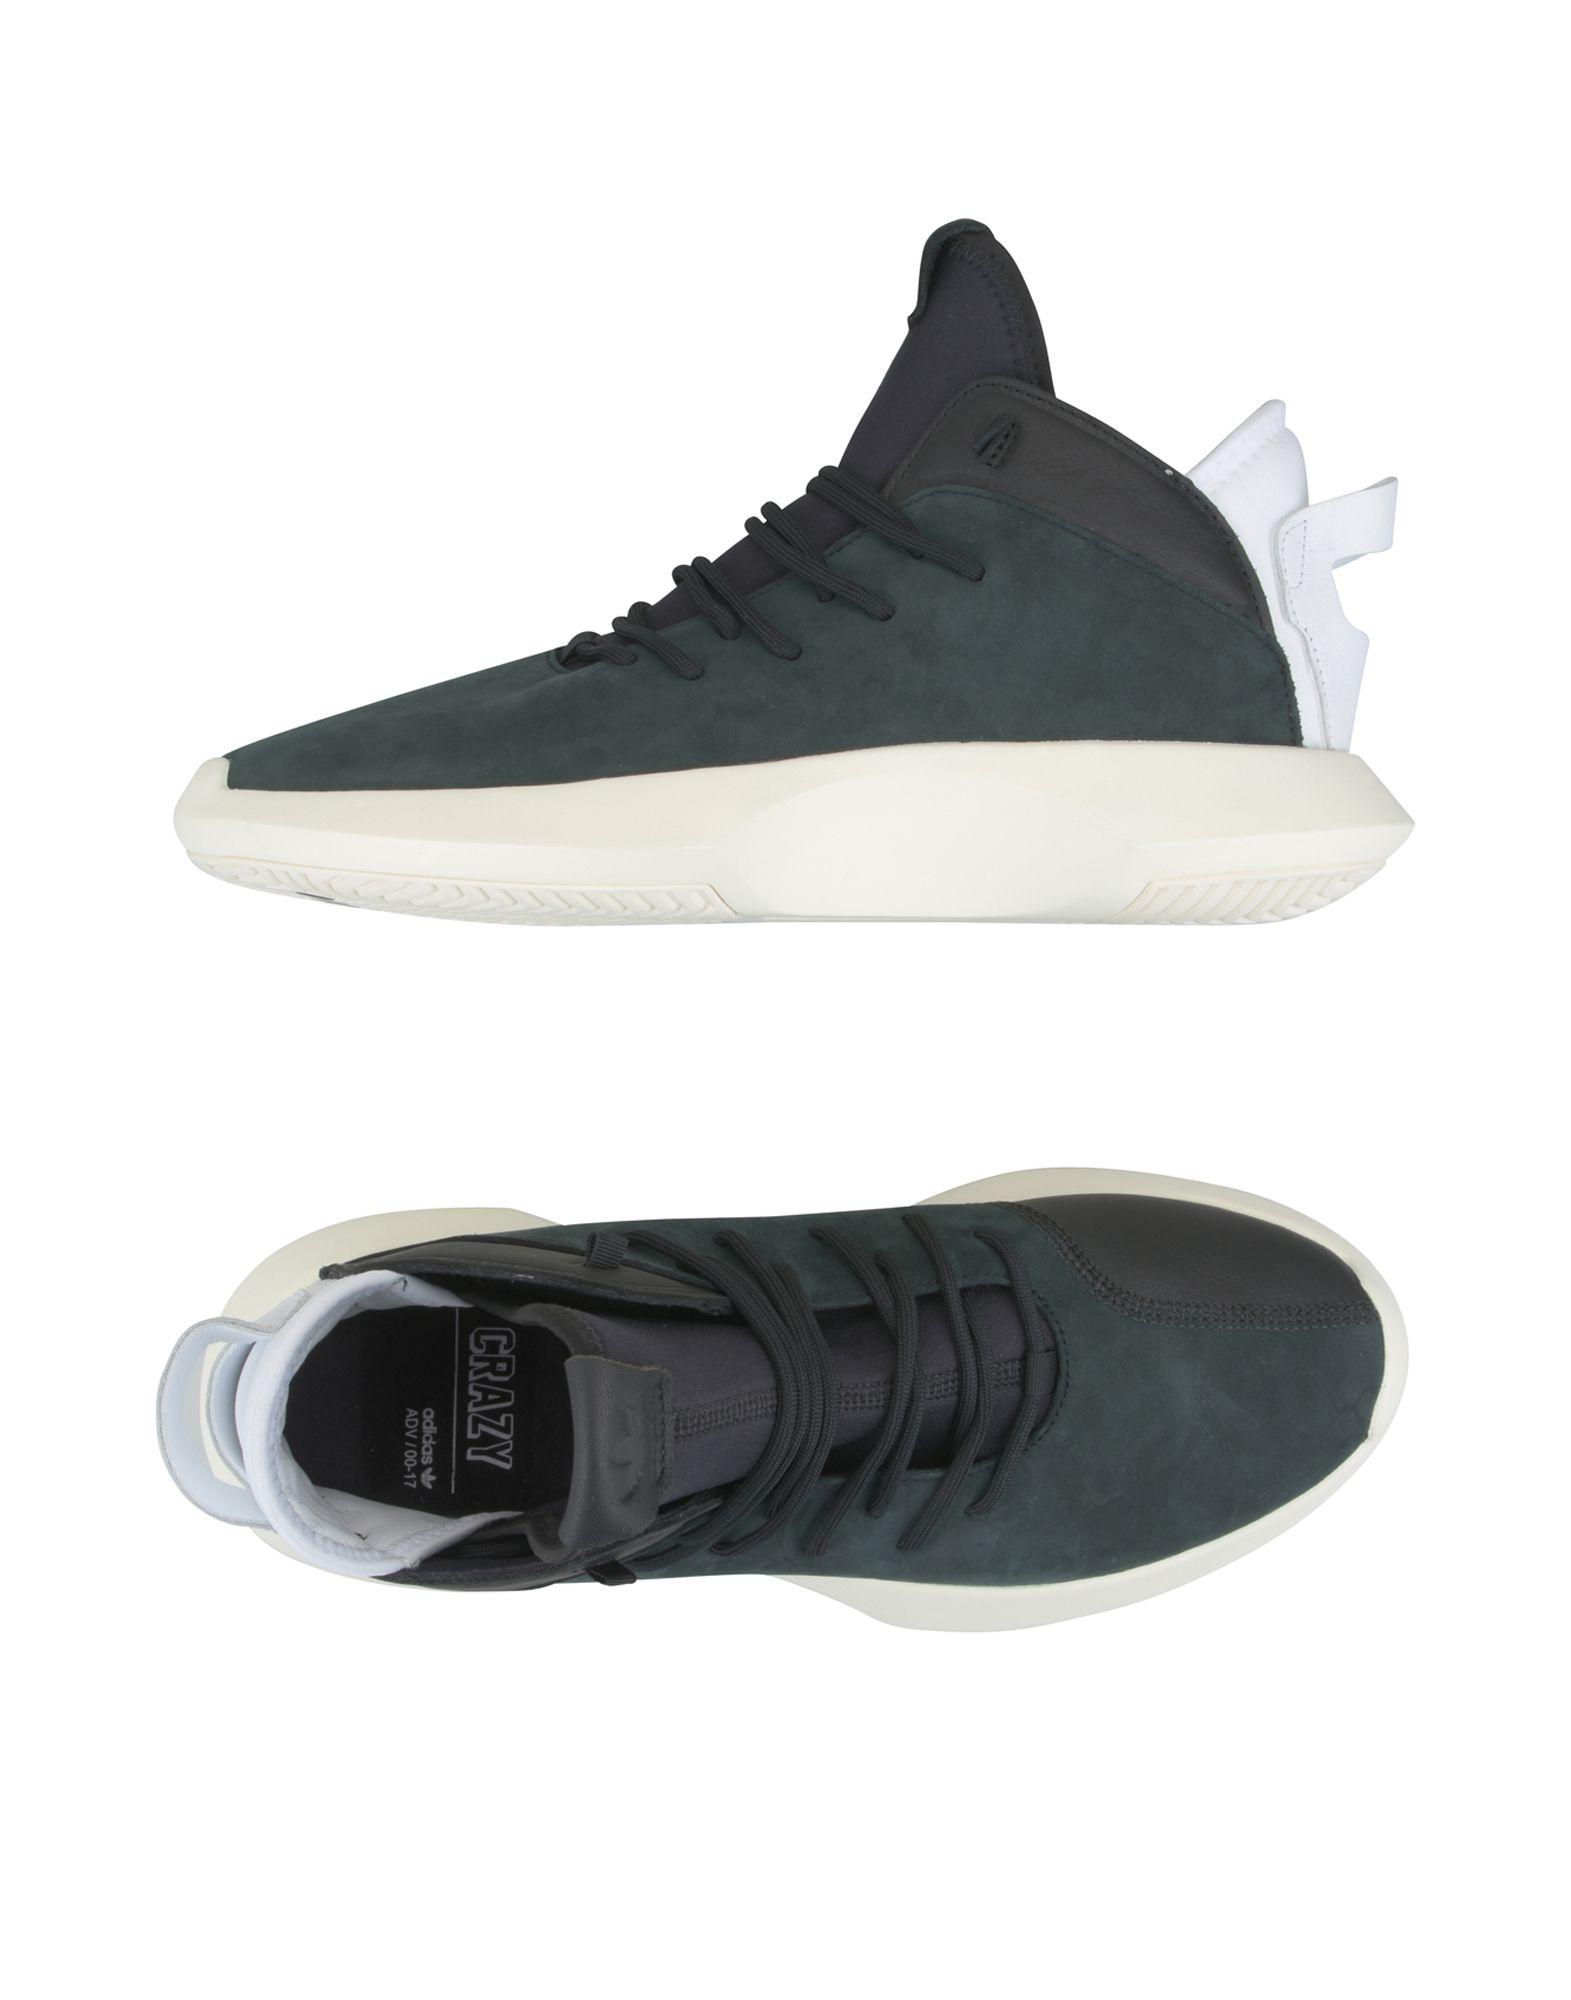 Sneakers Adidas Originals Crazy 1 Adv - Uomo - 11403469ON